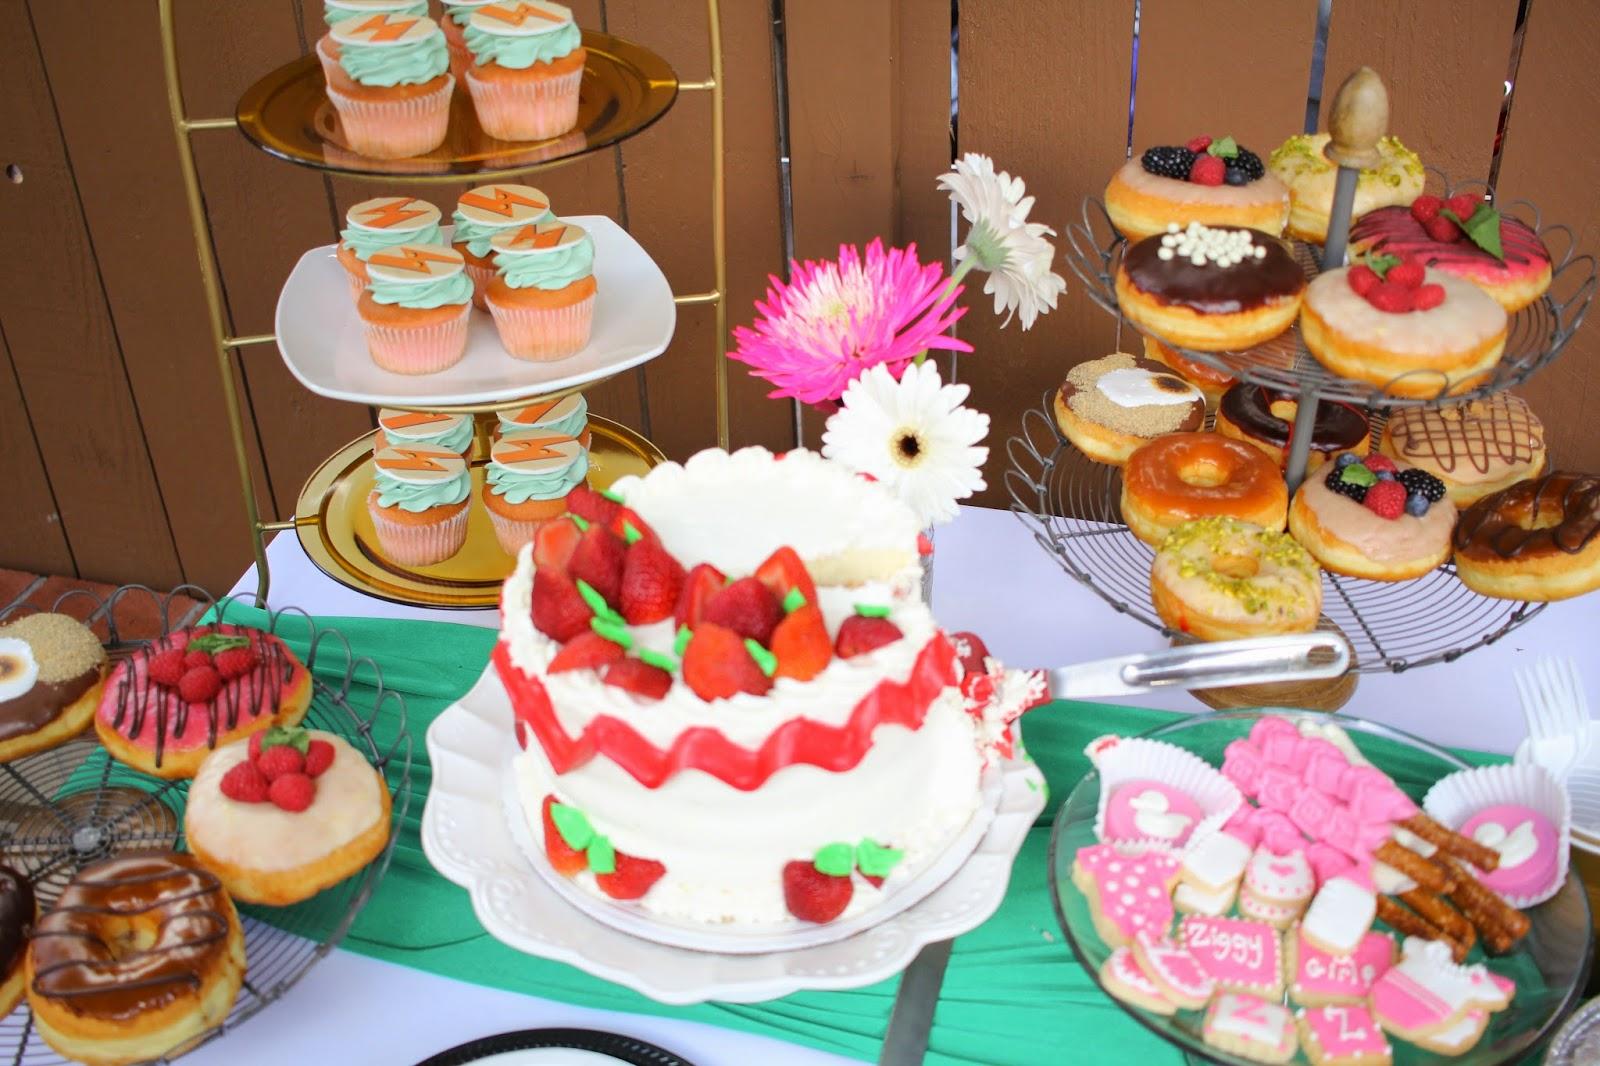 Bea's Bakery, Donut Snob, Ele Makes Cakes